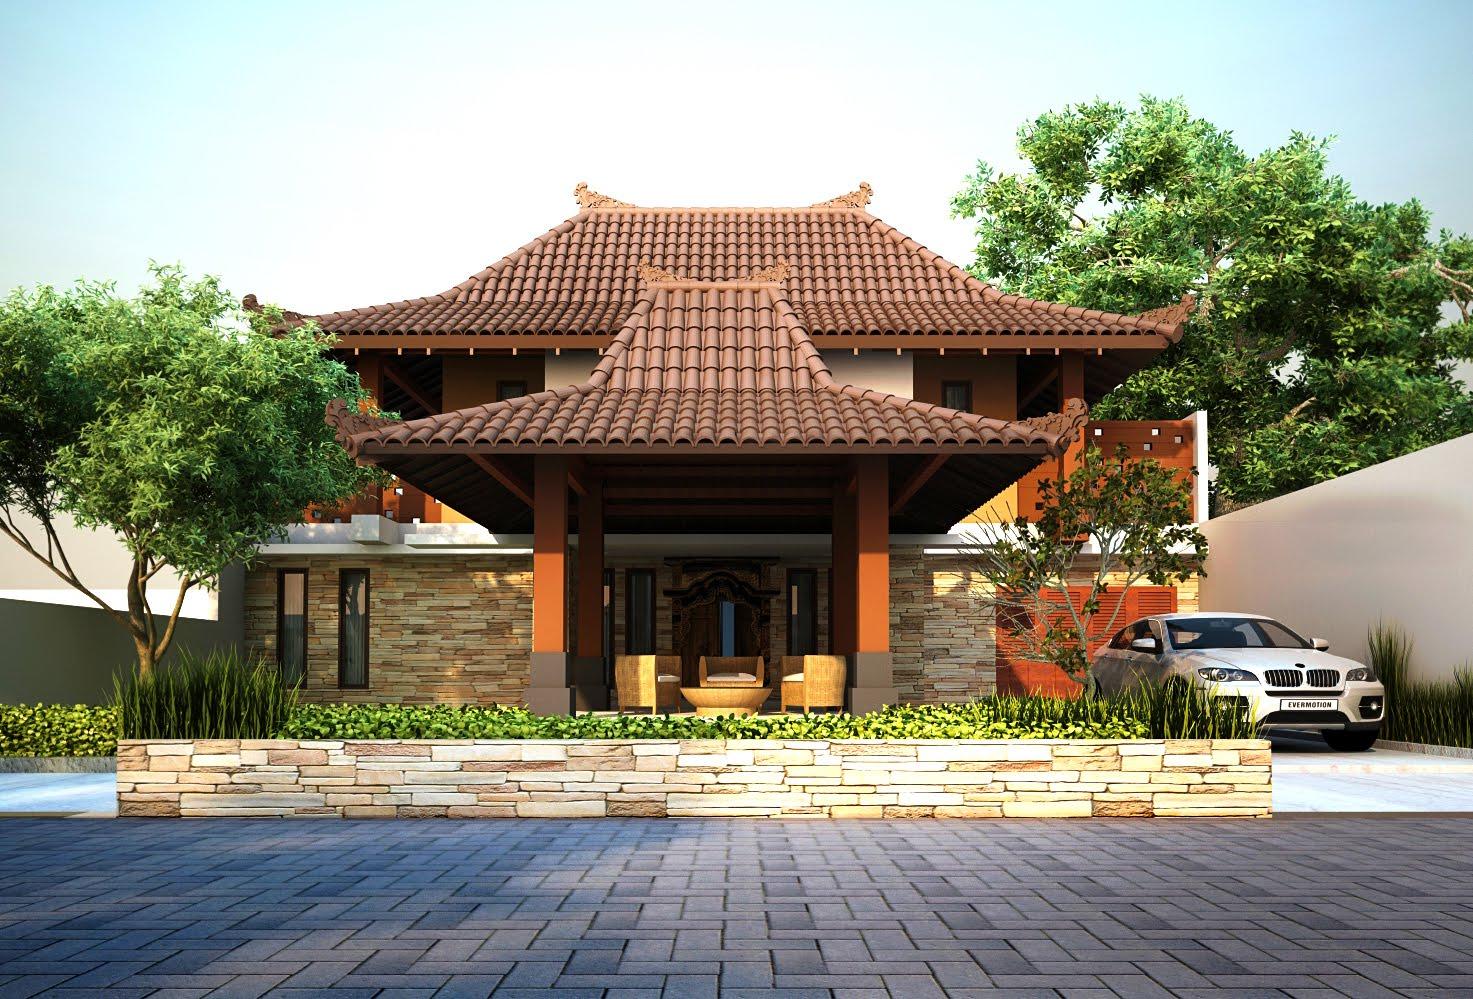 Filosofi Rumah Joglo Selain Bentuknya Unik Dan Juga Punya